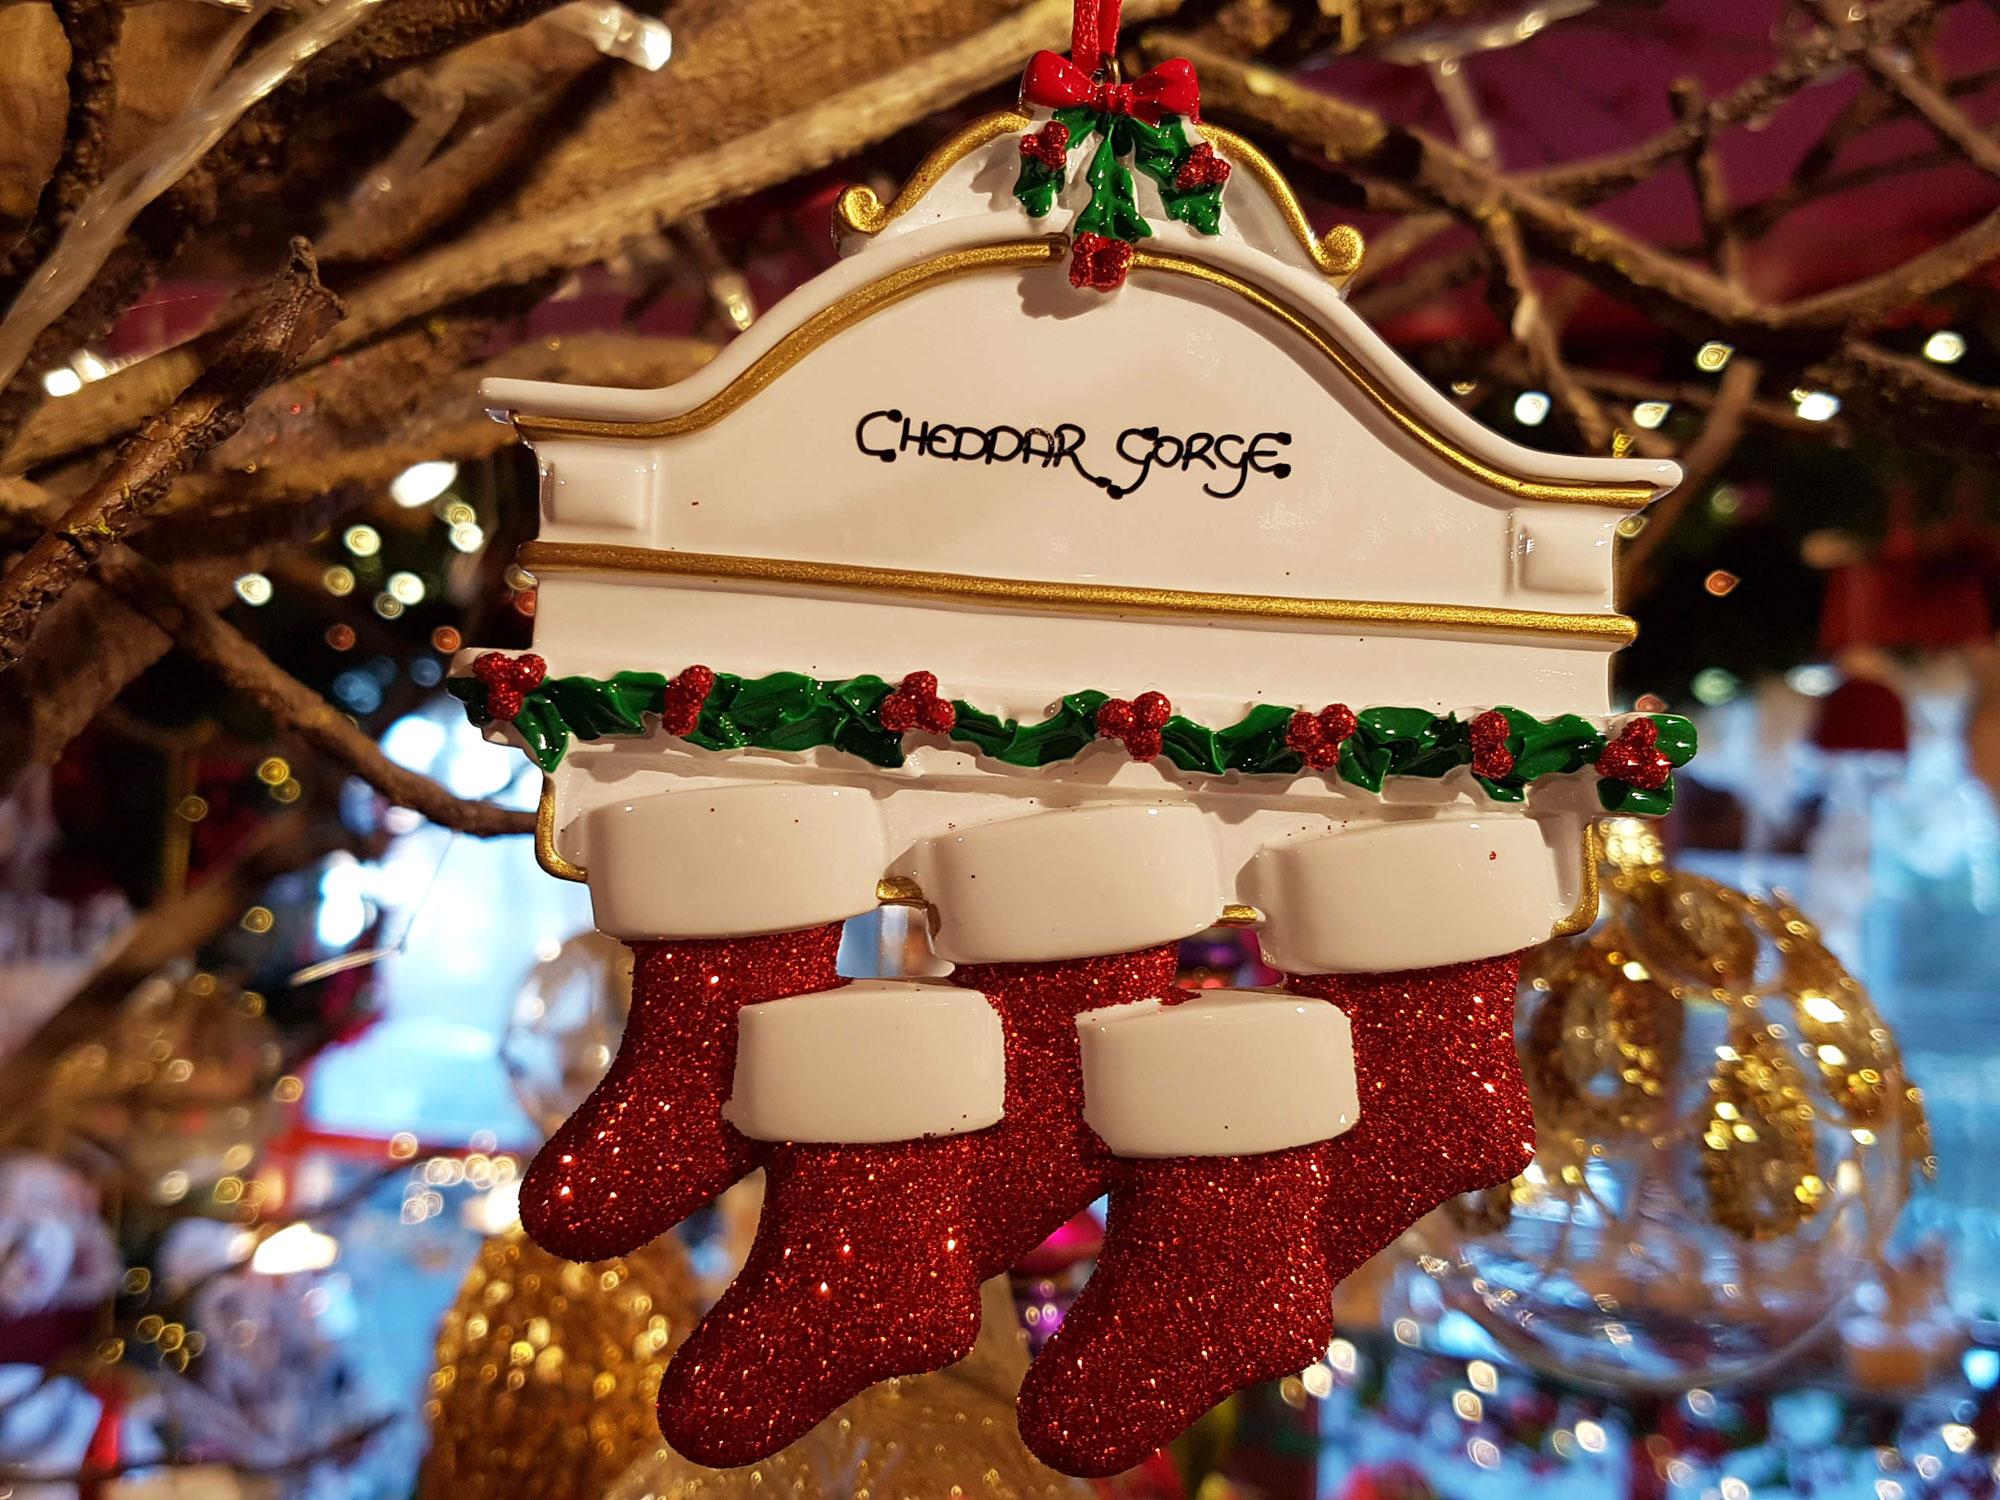 Cheddar Gorge White Mantle 5 Stockings Hanging Decoration